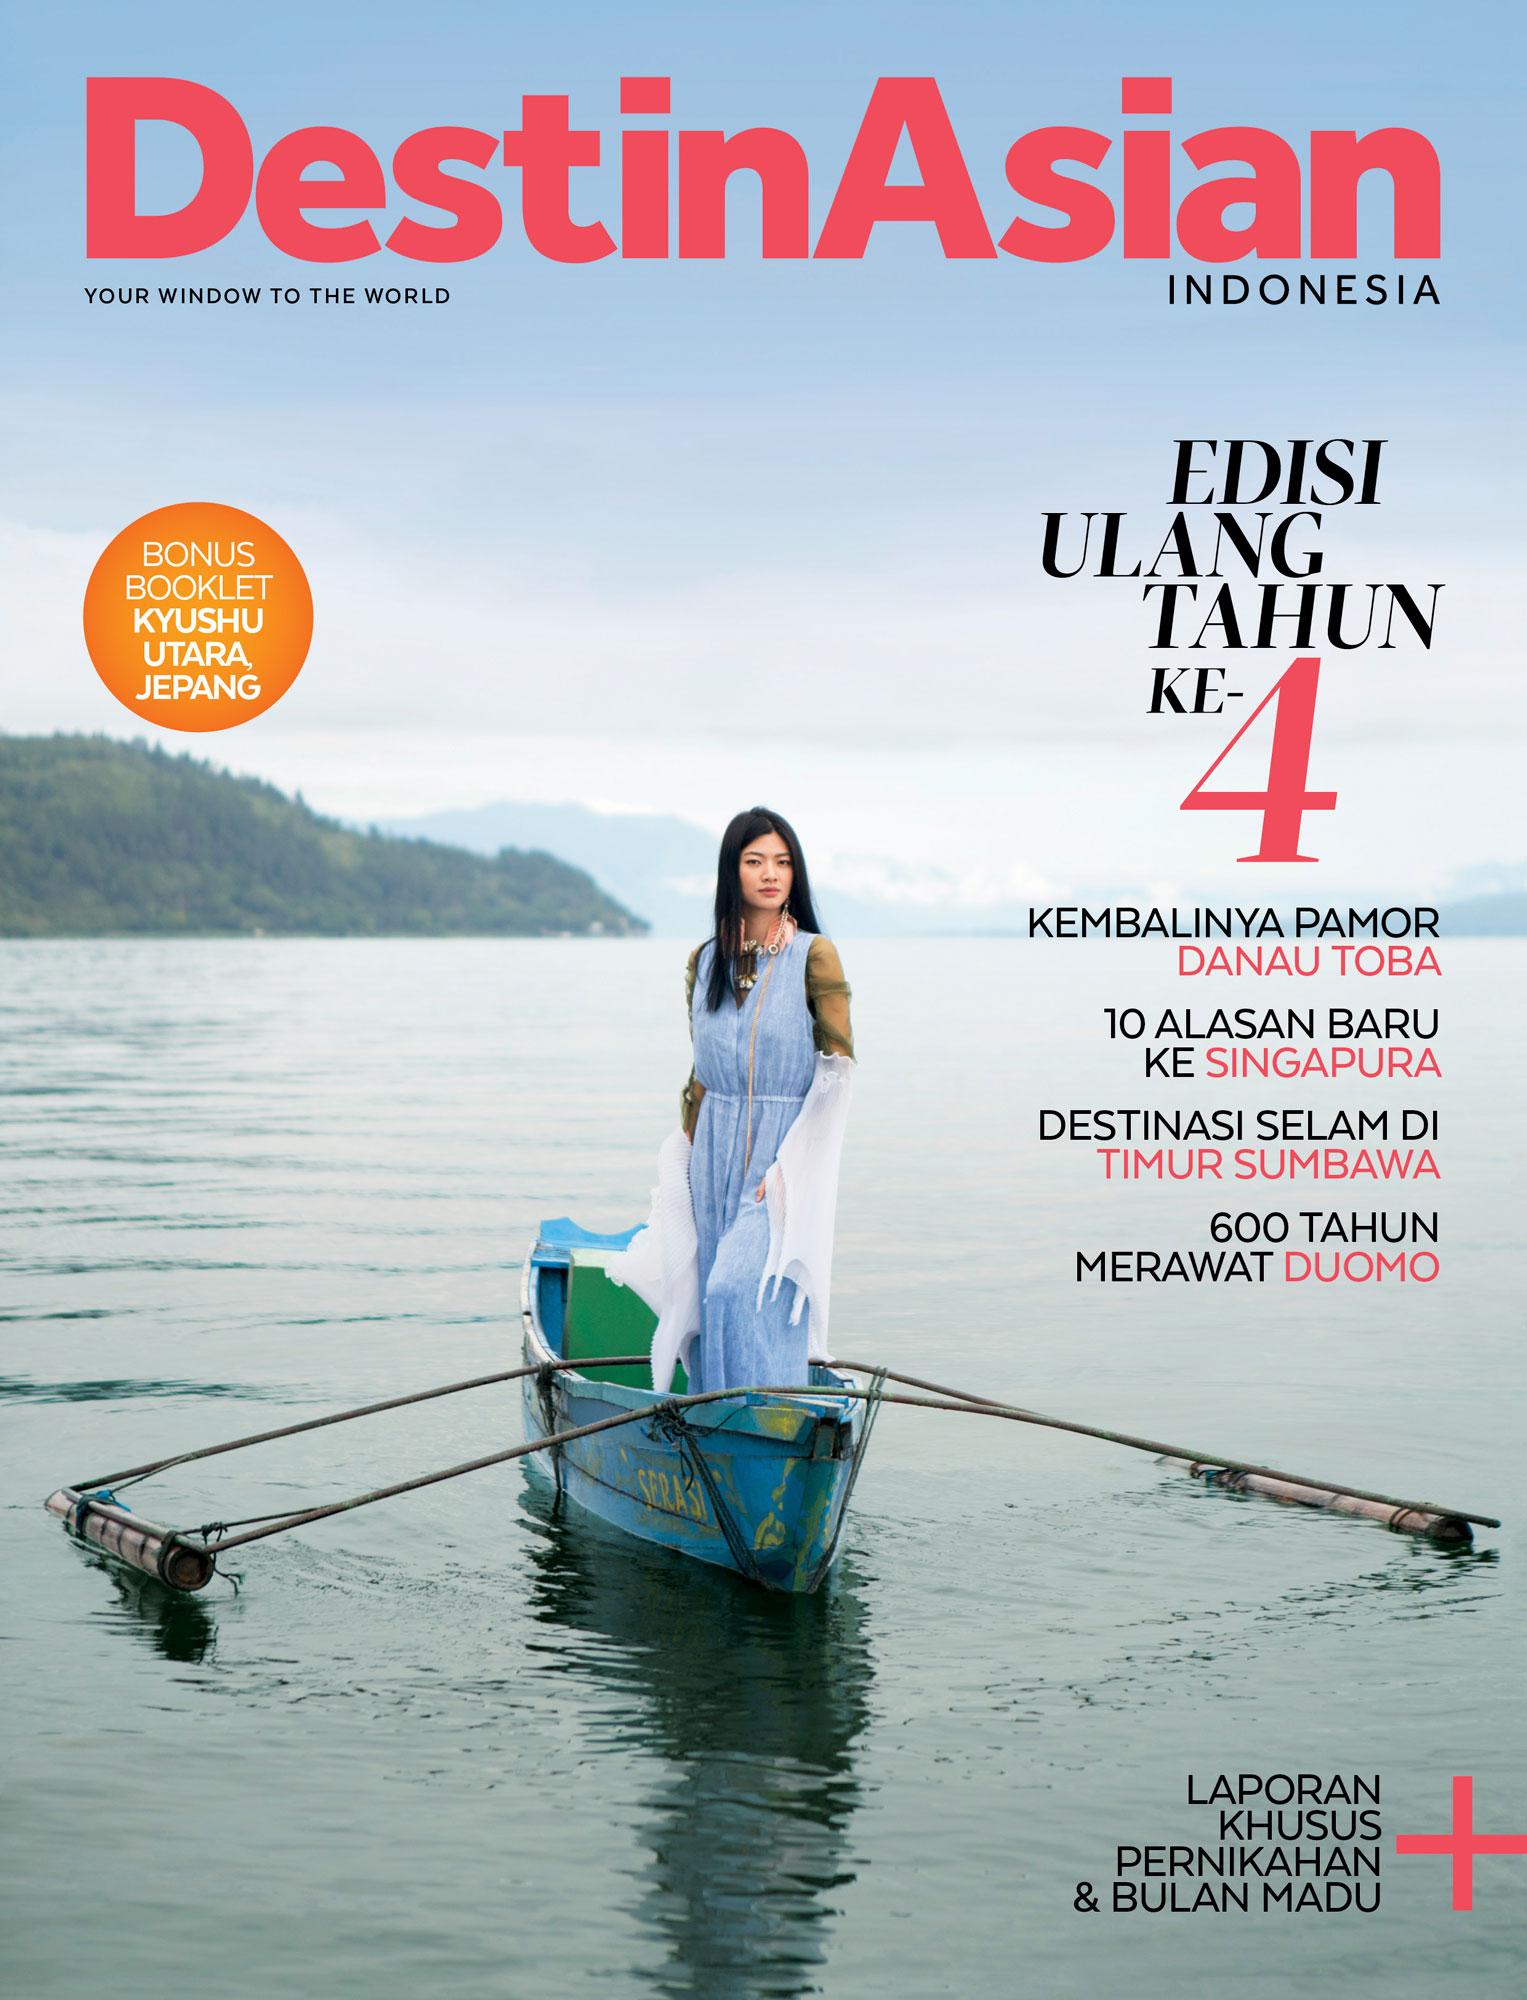 DestinAsian-Indonesia-Maret-April-2017_W.jpg